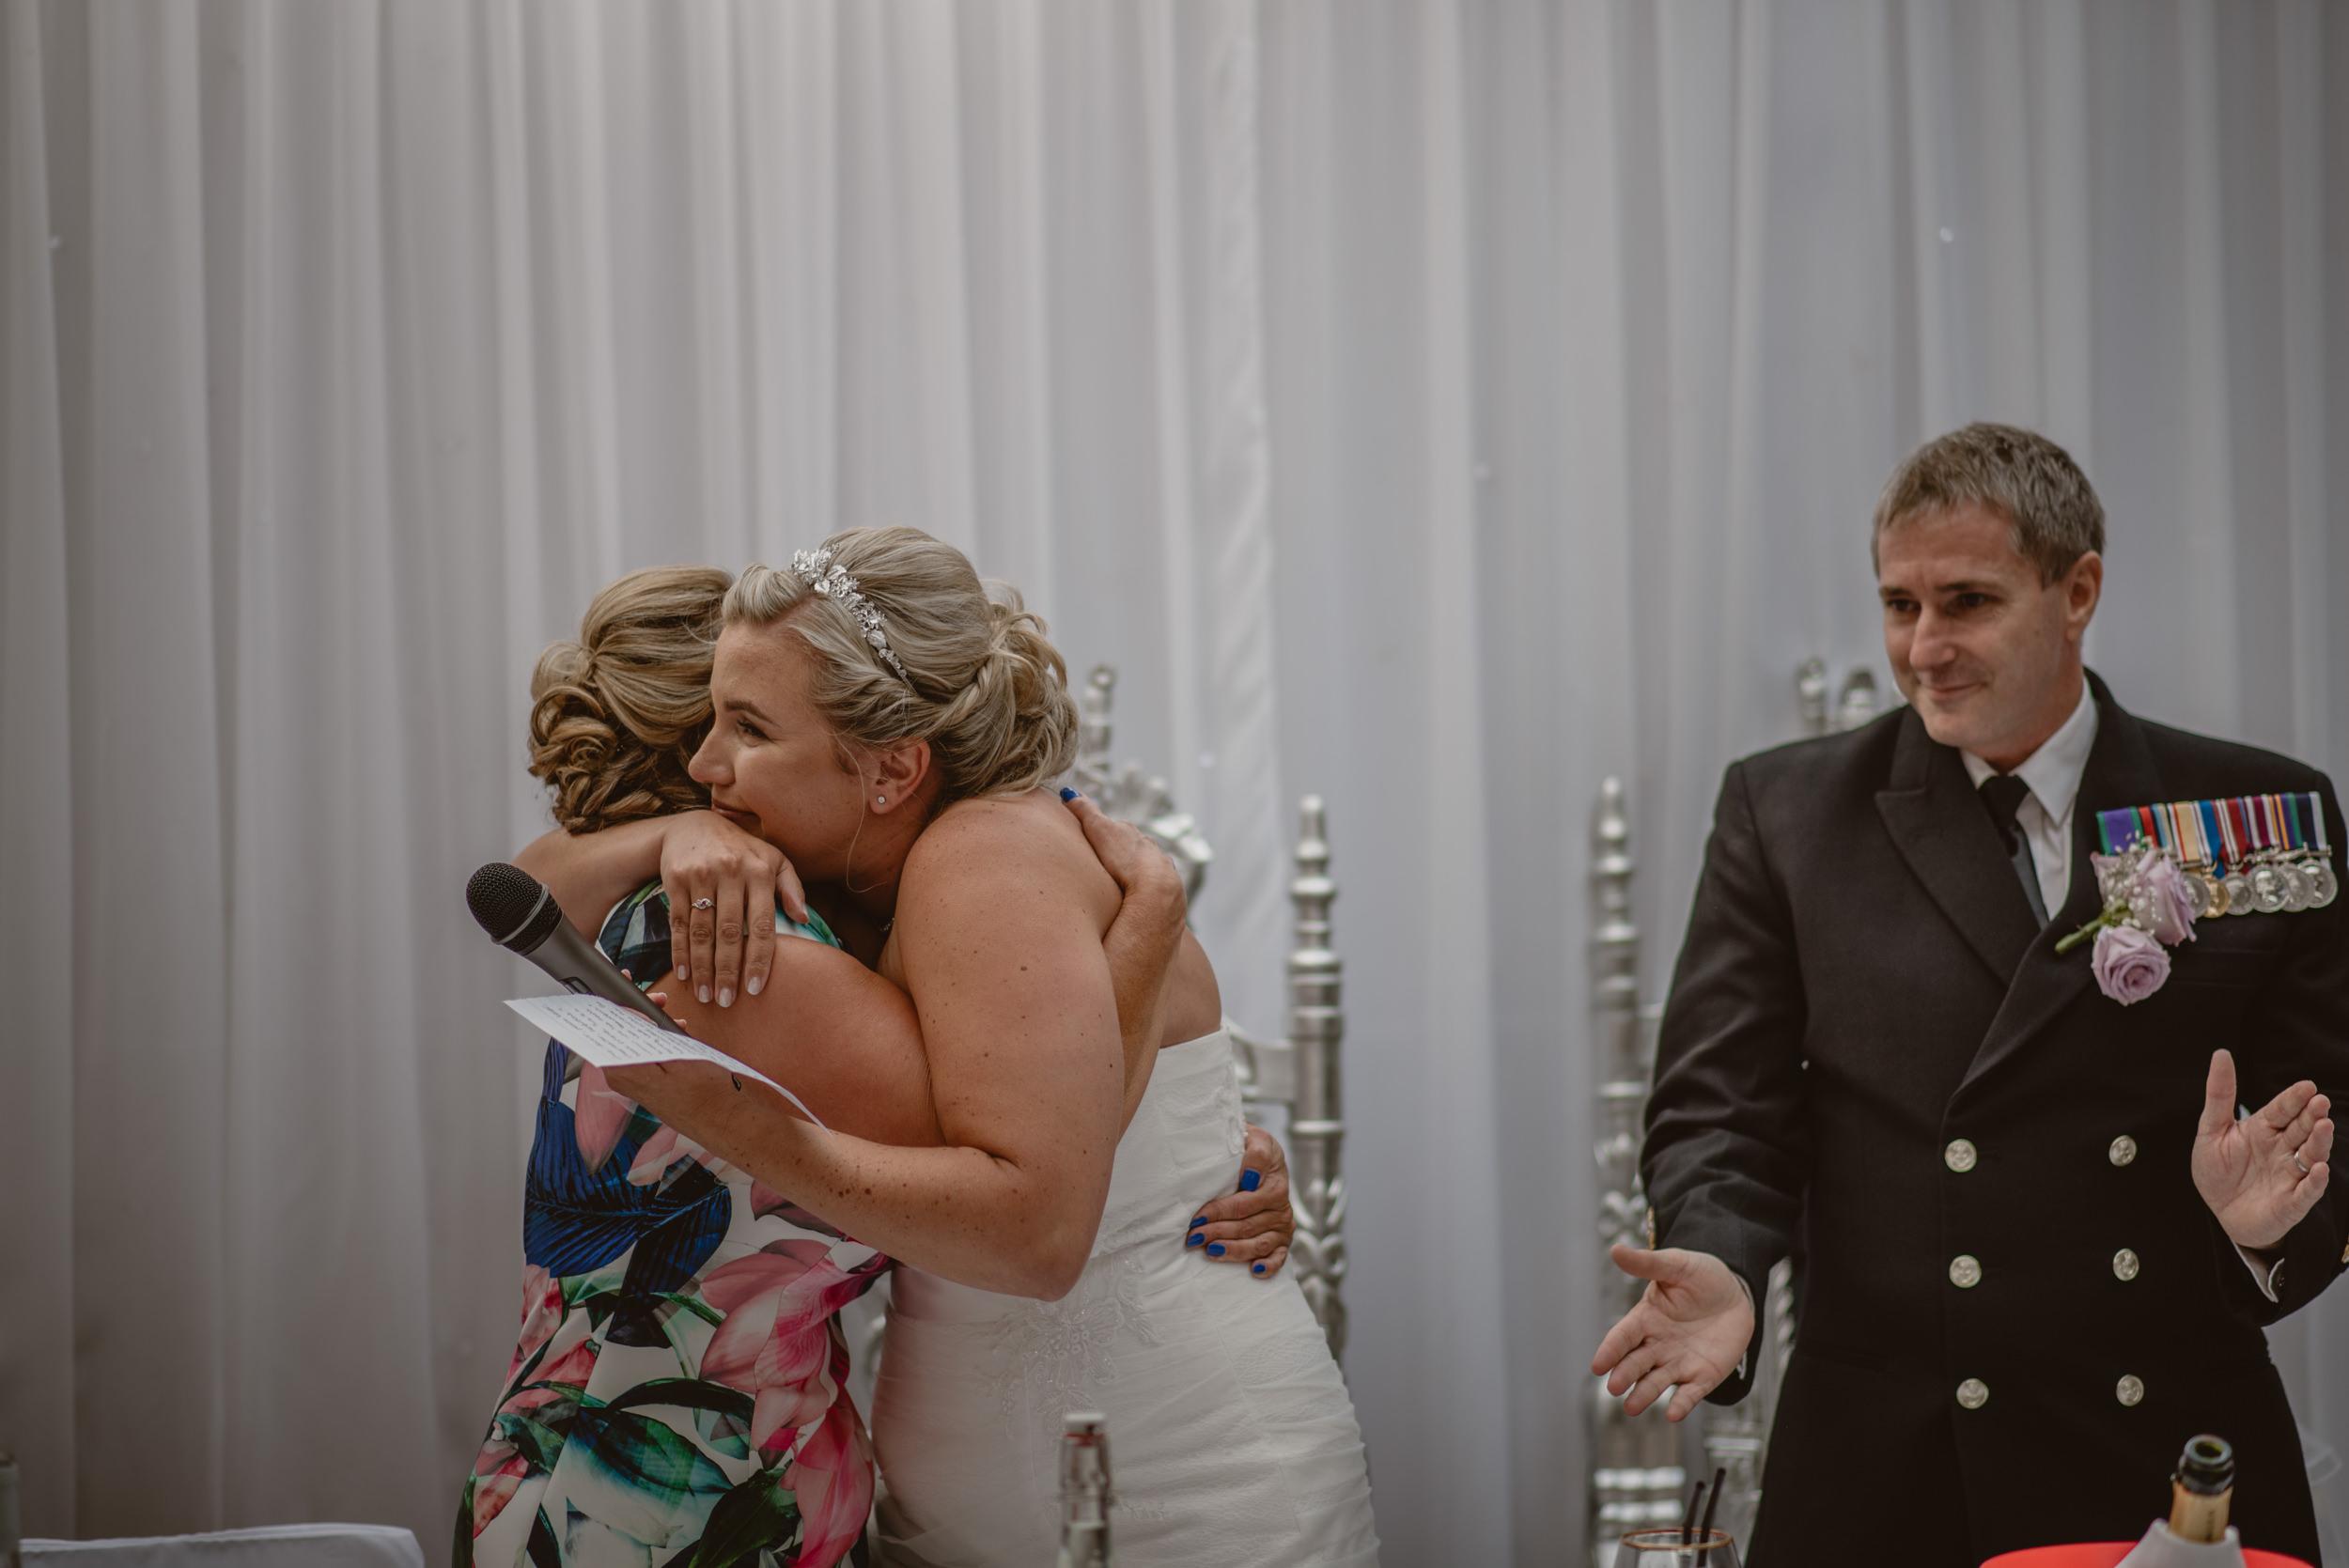 Chantelle-and-Stephen-Old-Thorns-Hotel-Wedding-Liphook-Manu-Mendoza-Wedding-Photography-400.jpg